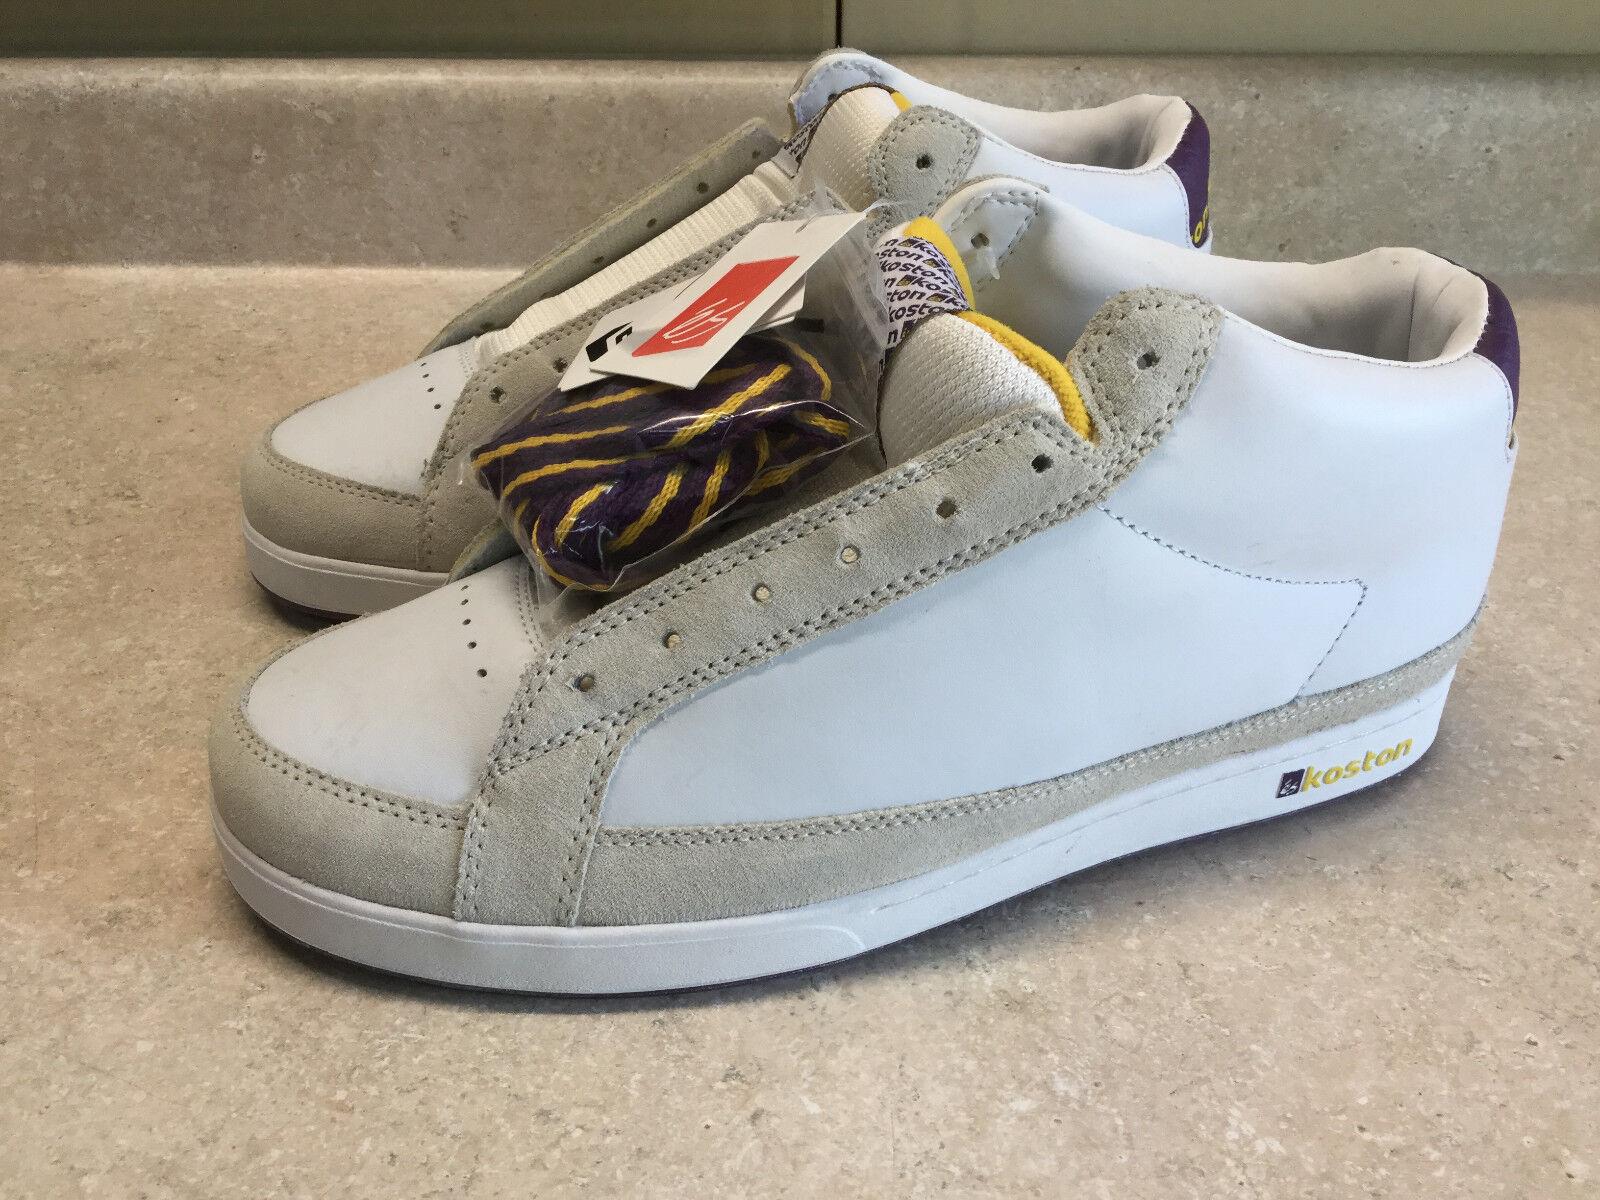 Mens Vintage ES Footwear Eric Koston Size 12 Skate Shoes K6 White Grey Purple